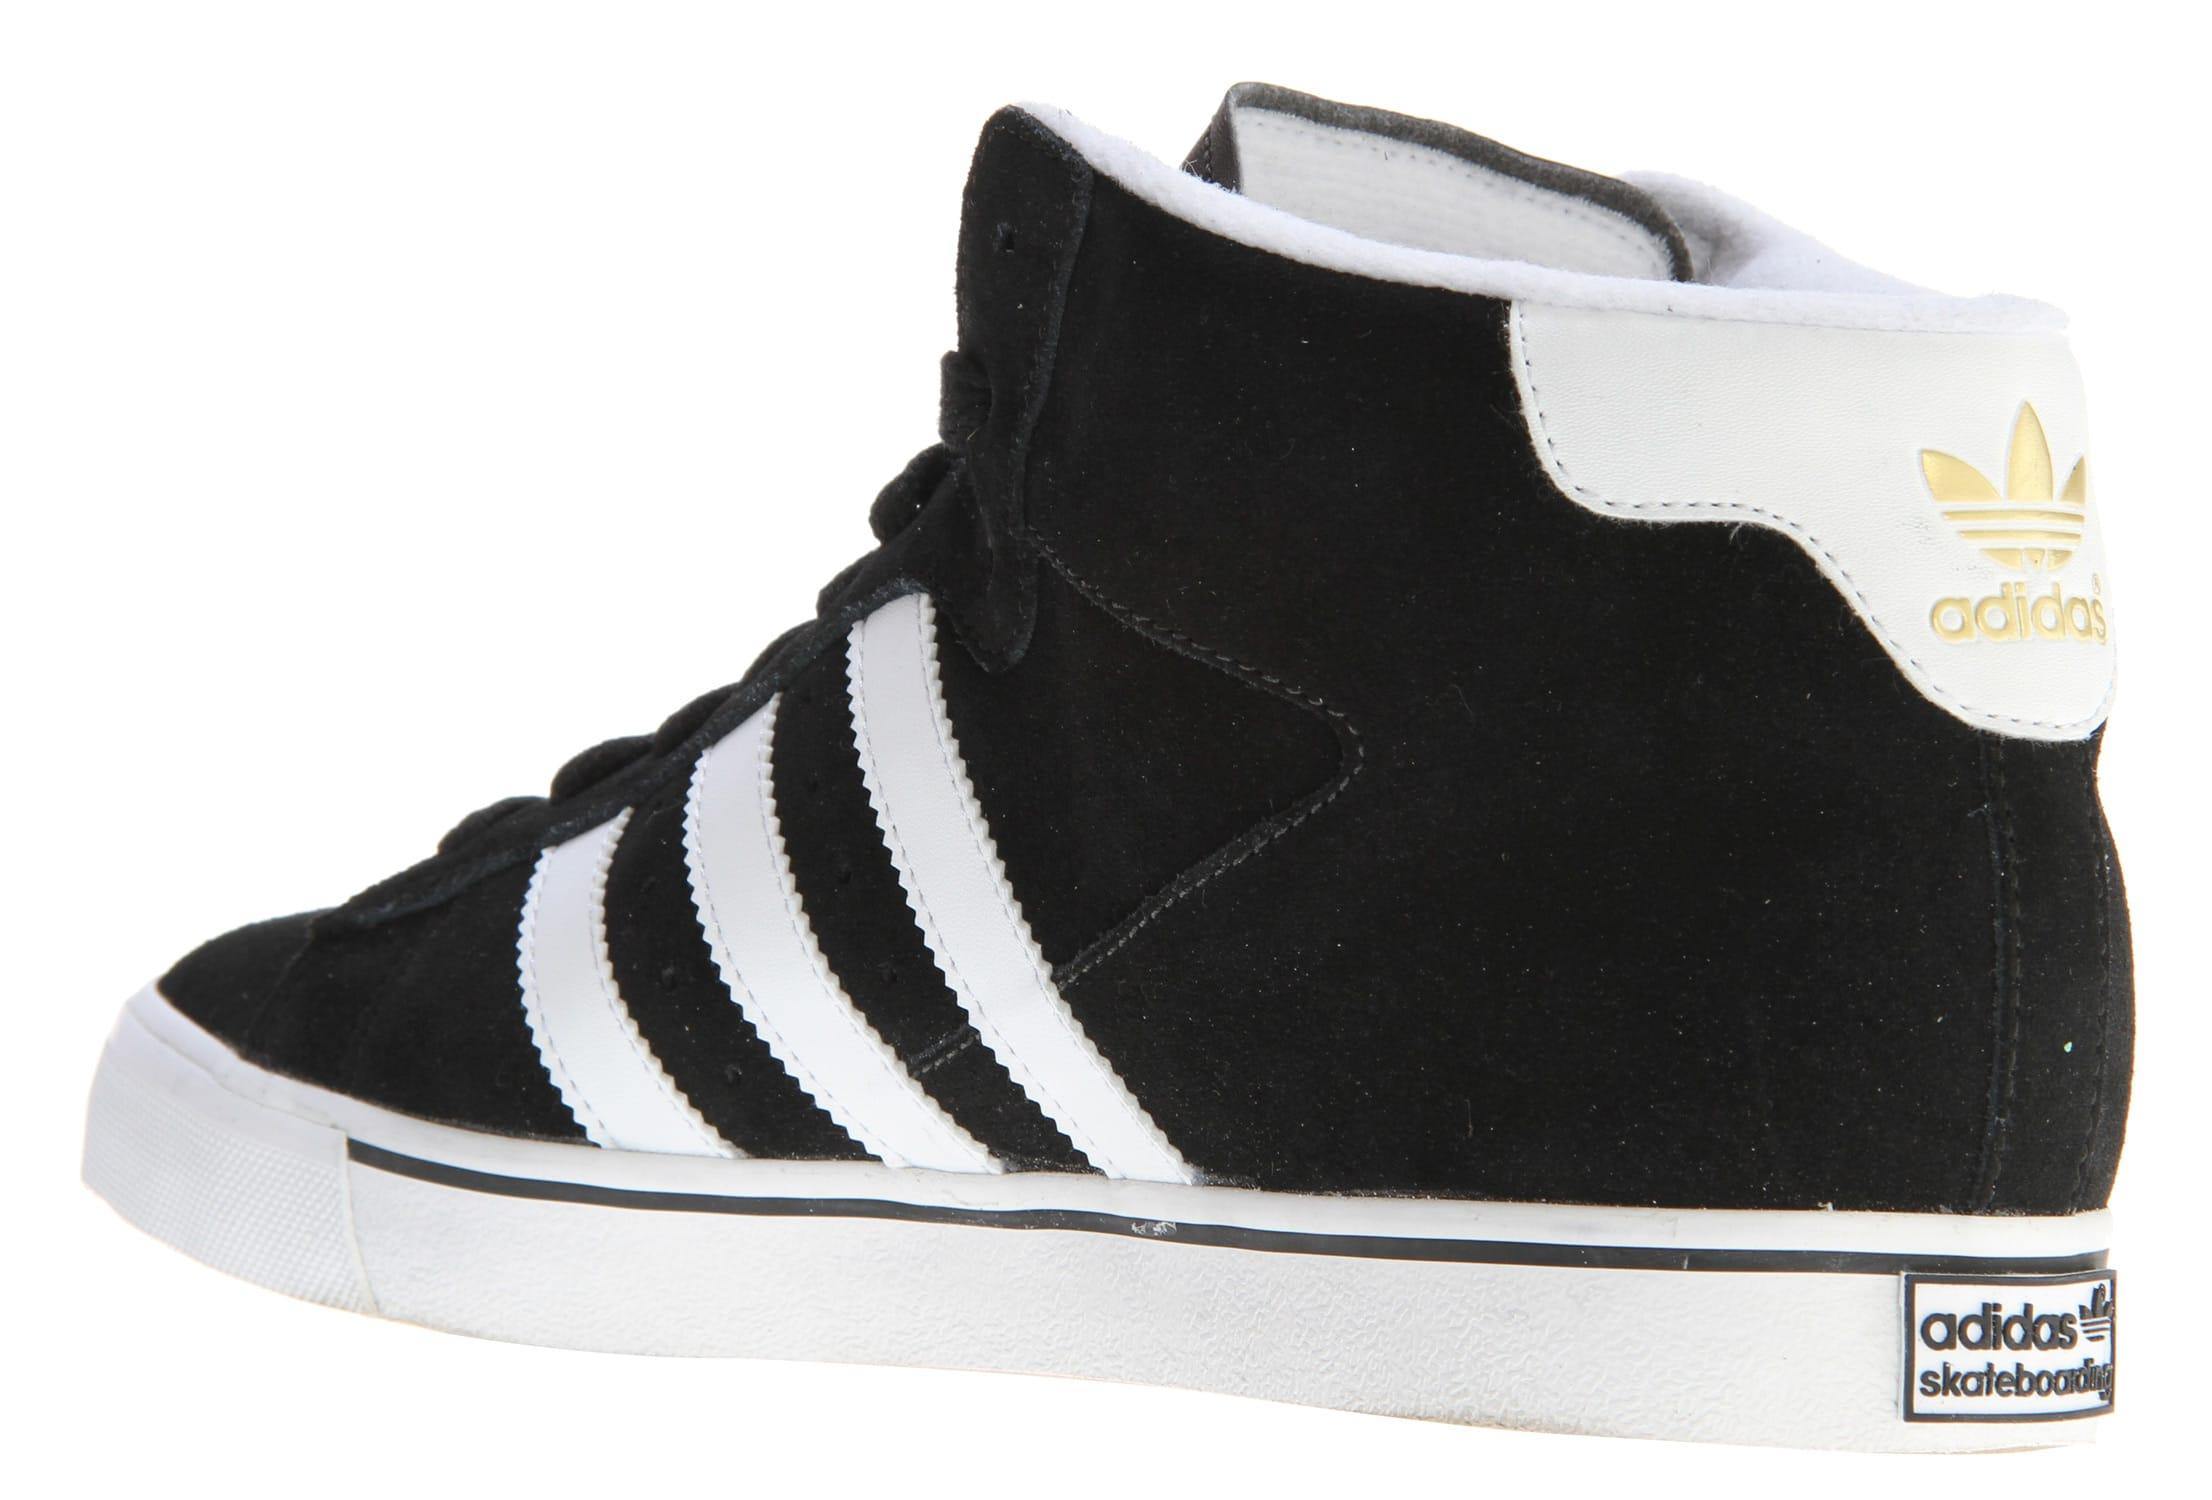 Adidas Campus Vulc Mid Skate Shoes